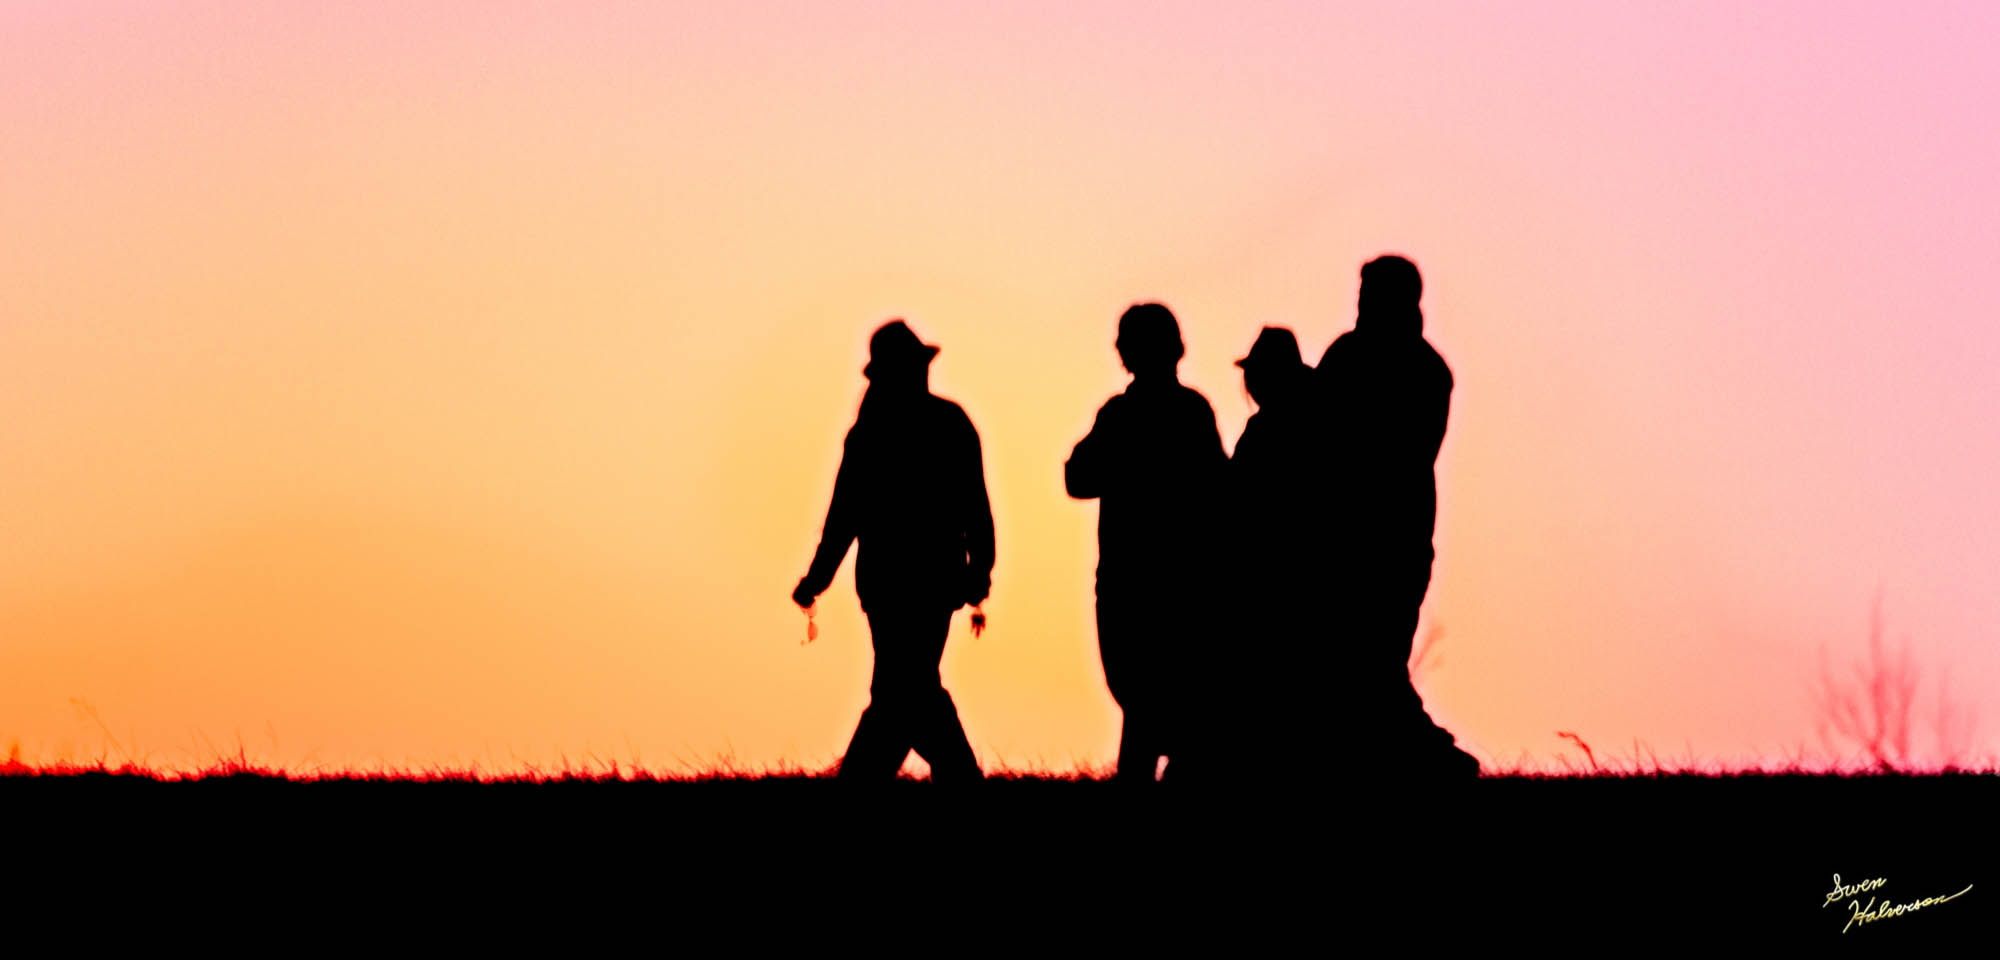 Theme: Walk | Title: Walking In The Sunset